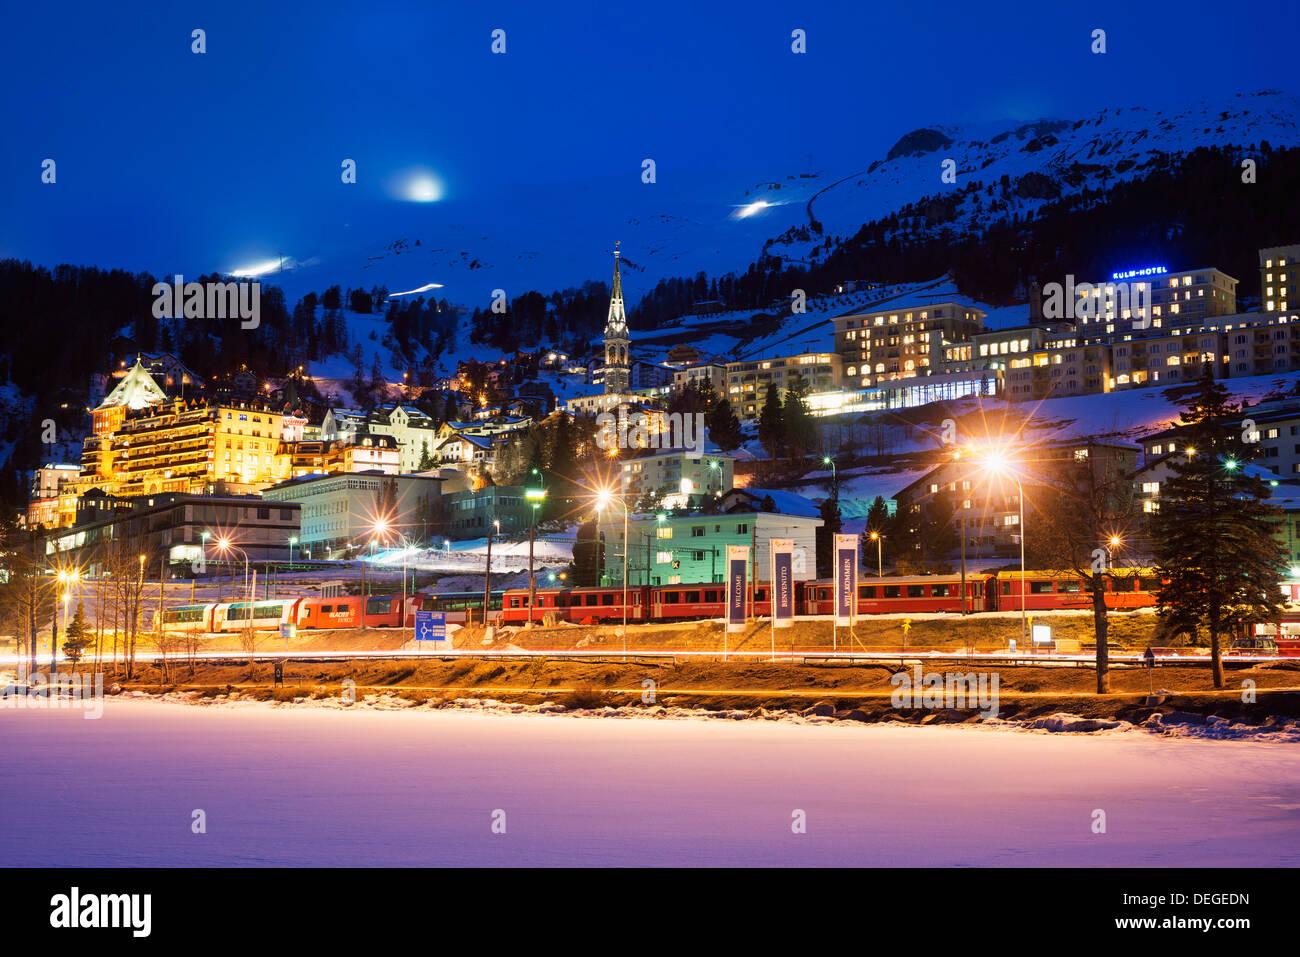 St. Moritz, Graubunden, Swiss Alps, Switzerland, Europe - Stock Image